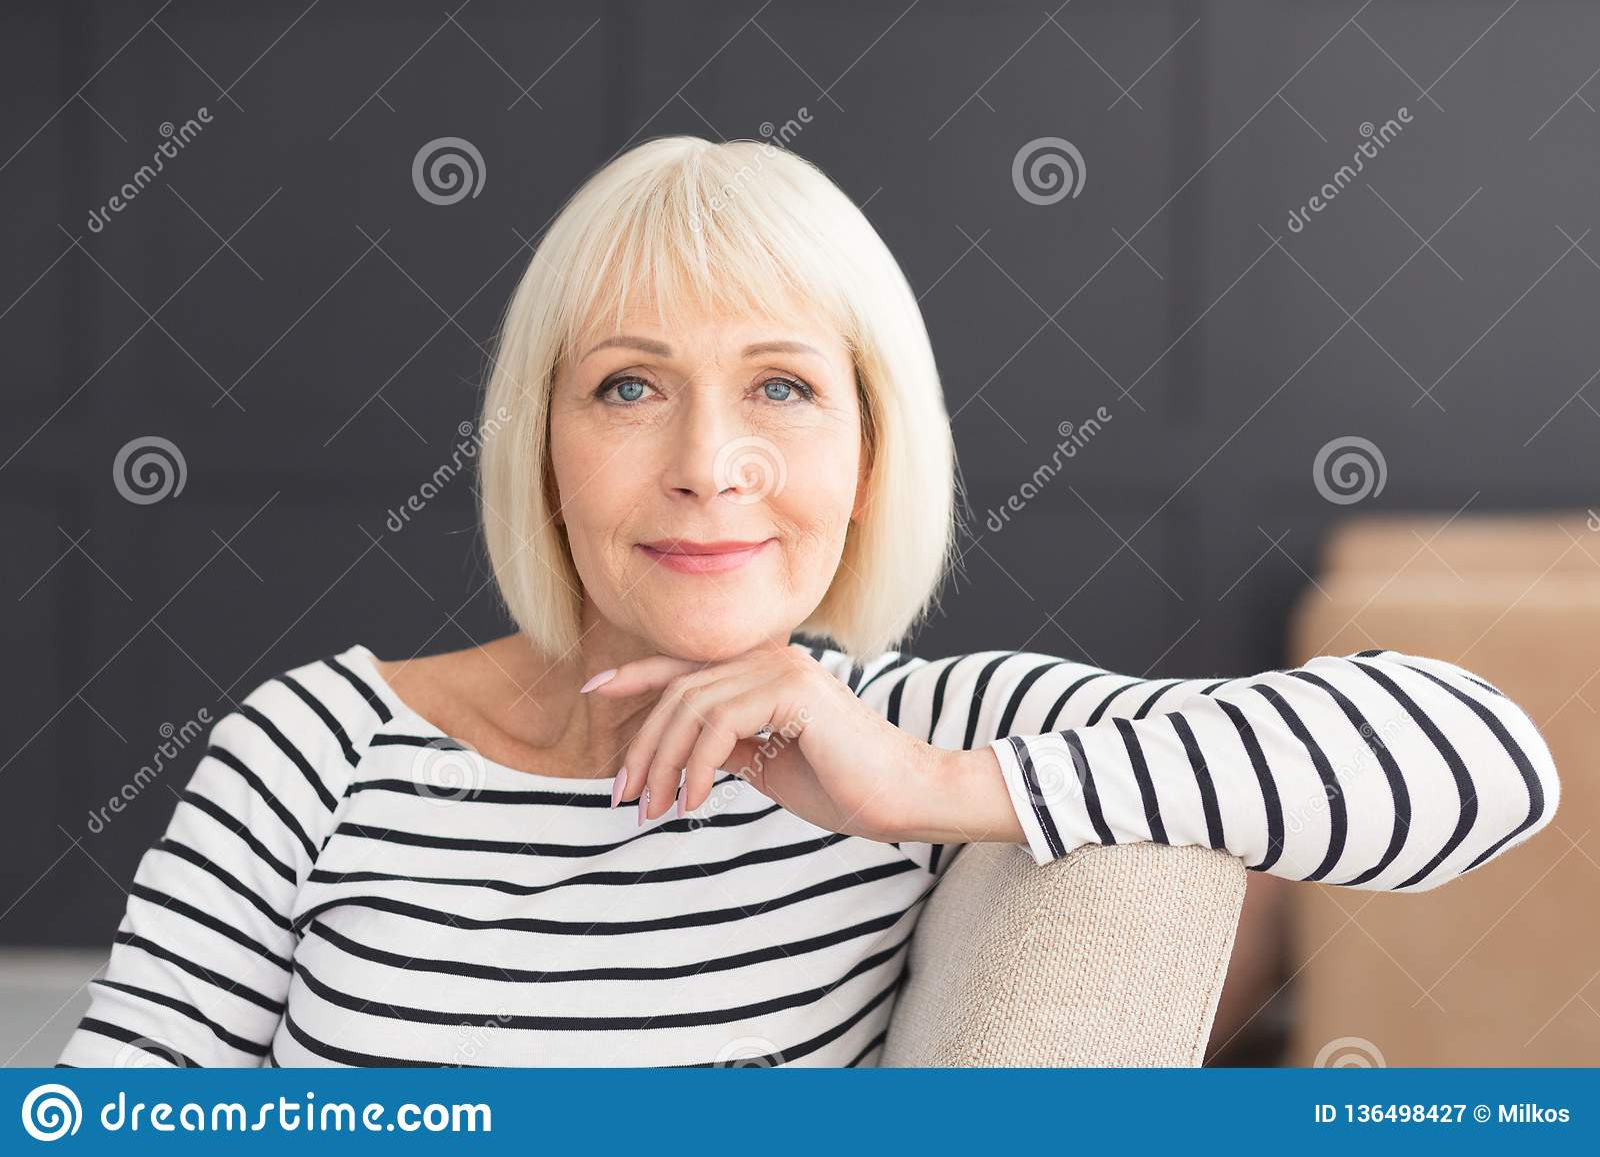 Beau sourire actif de femme amical et regard in camera